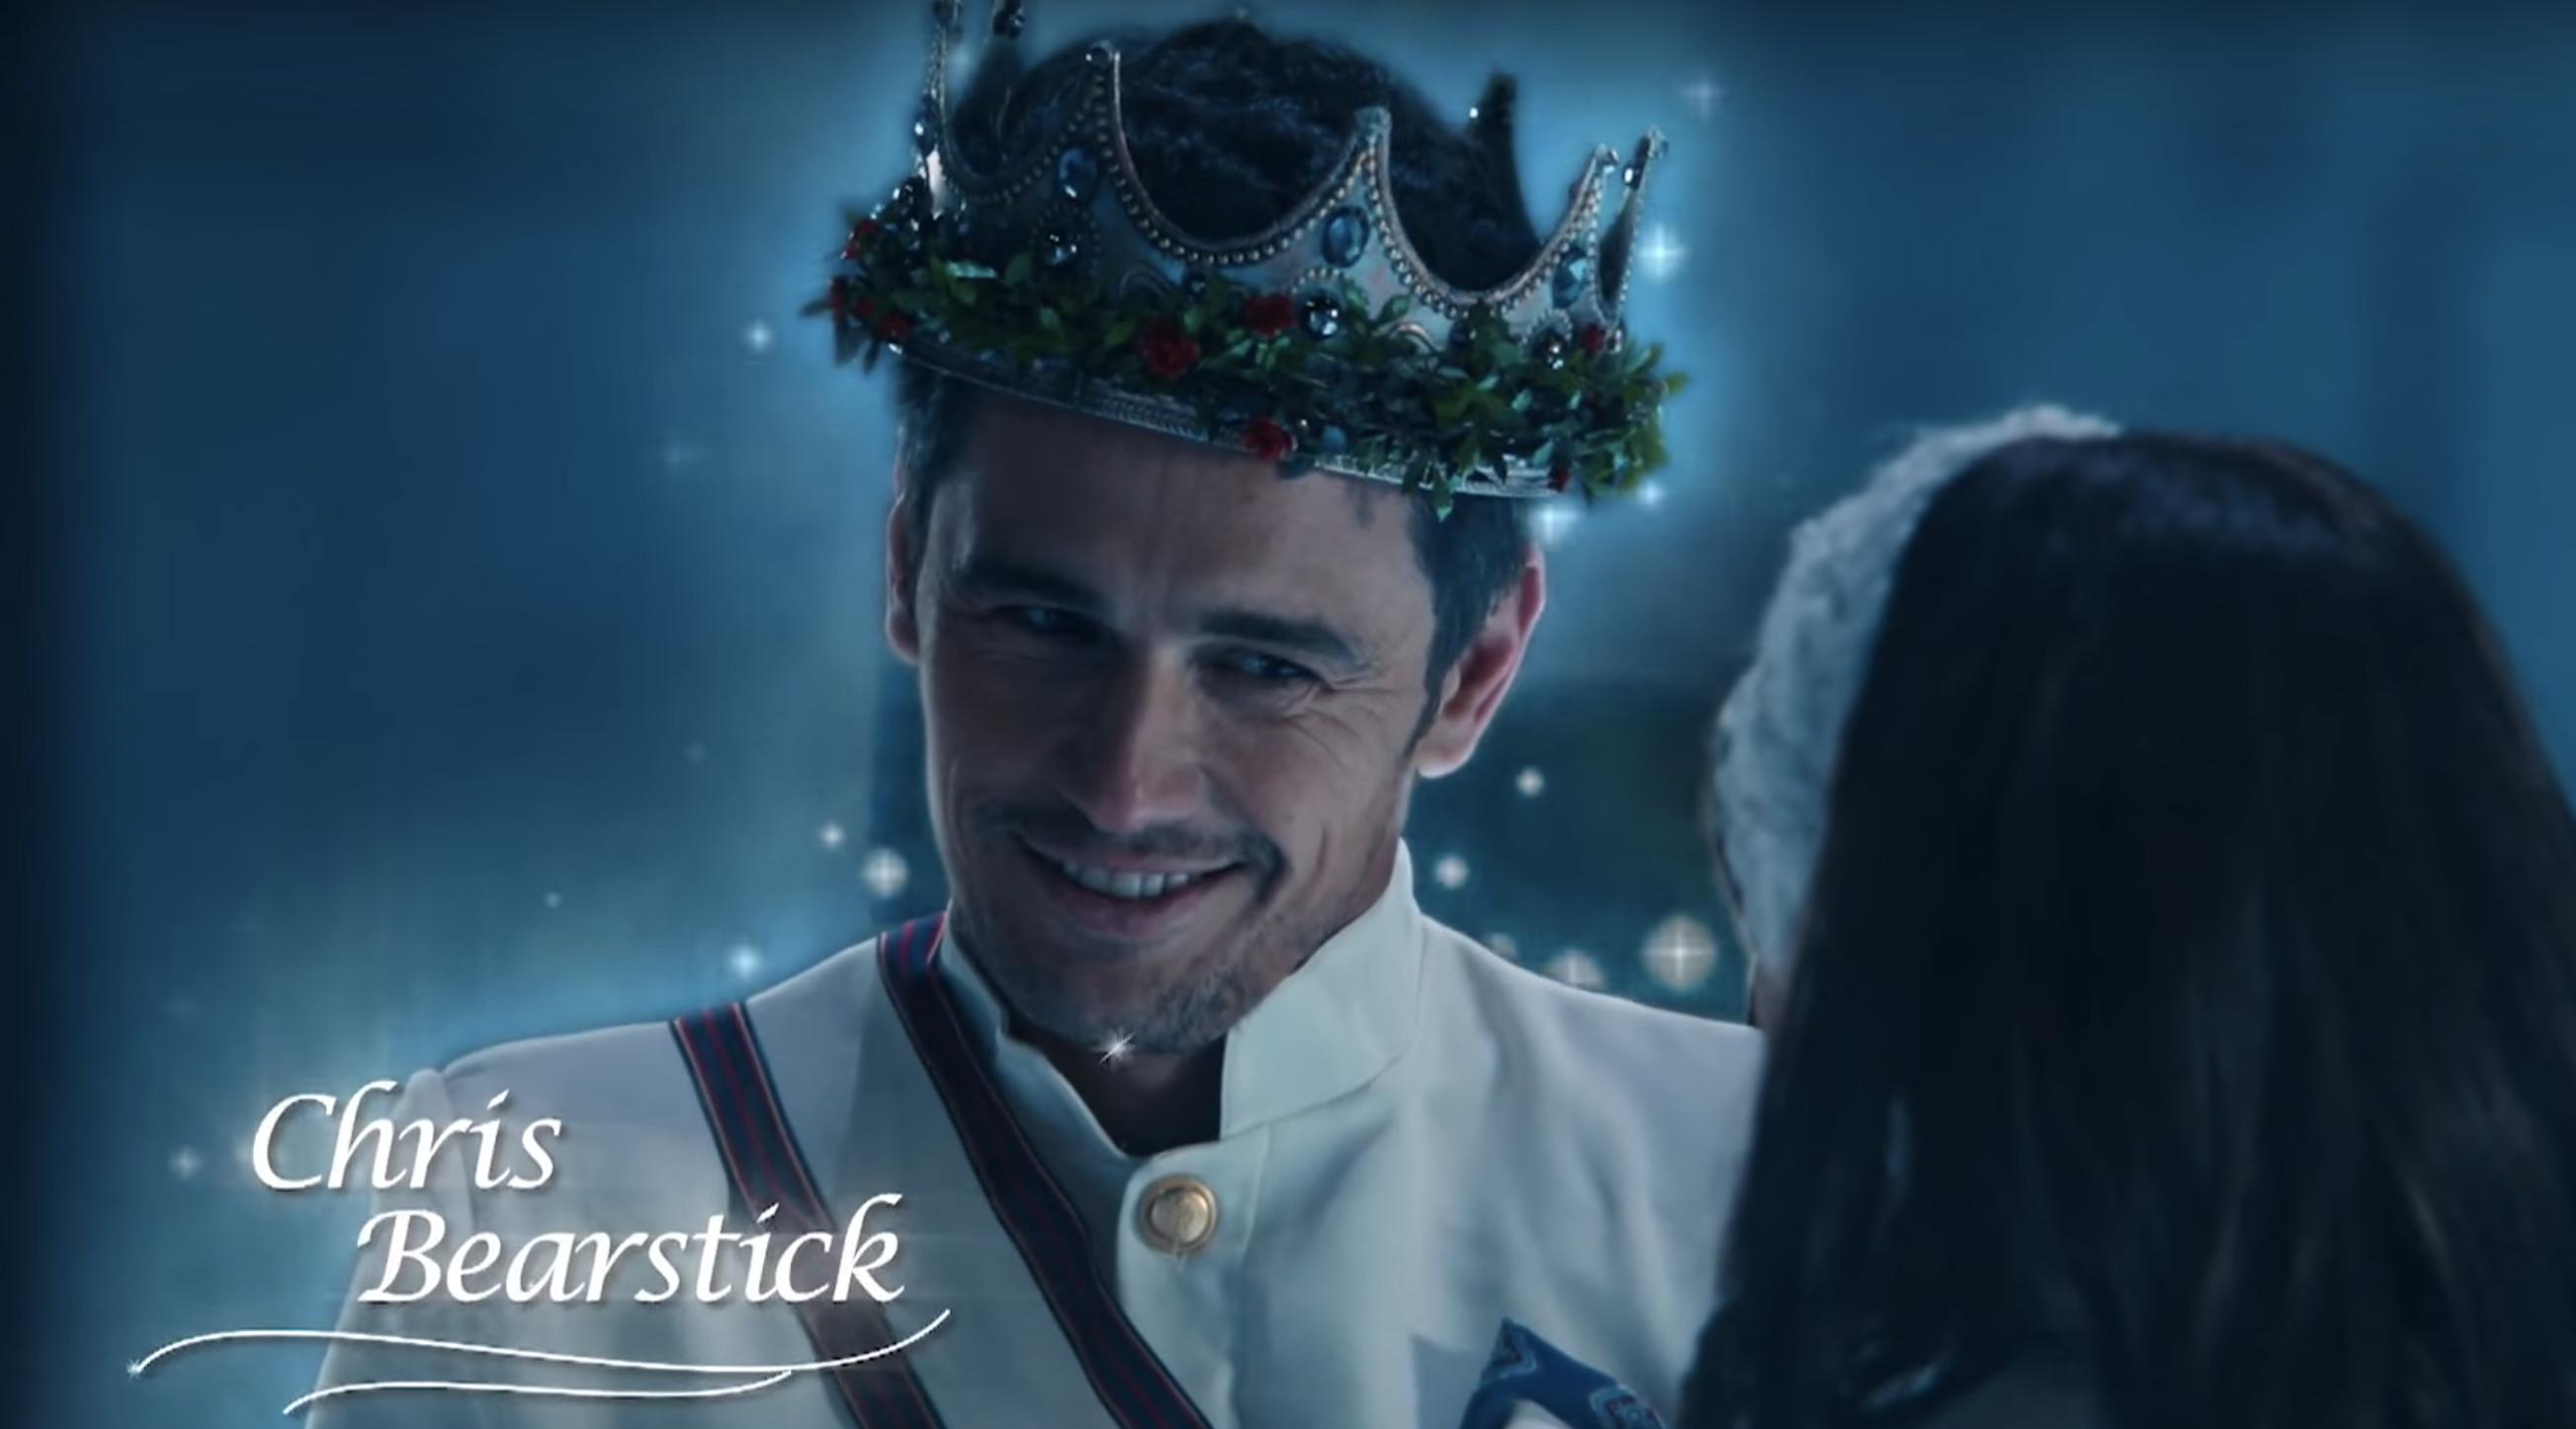 Retro James Franco Spoofing Hallmark Holiday Movies On Snl Hallmark Holiday Movies Holiday Movie James Franco